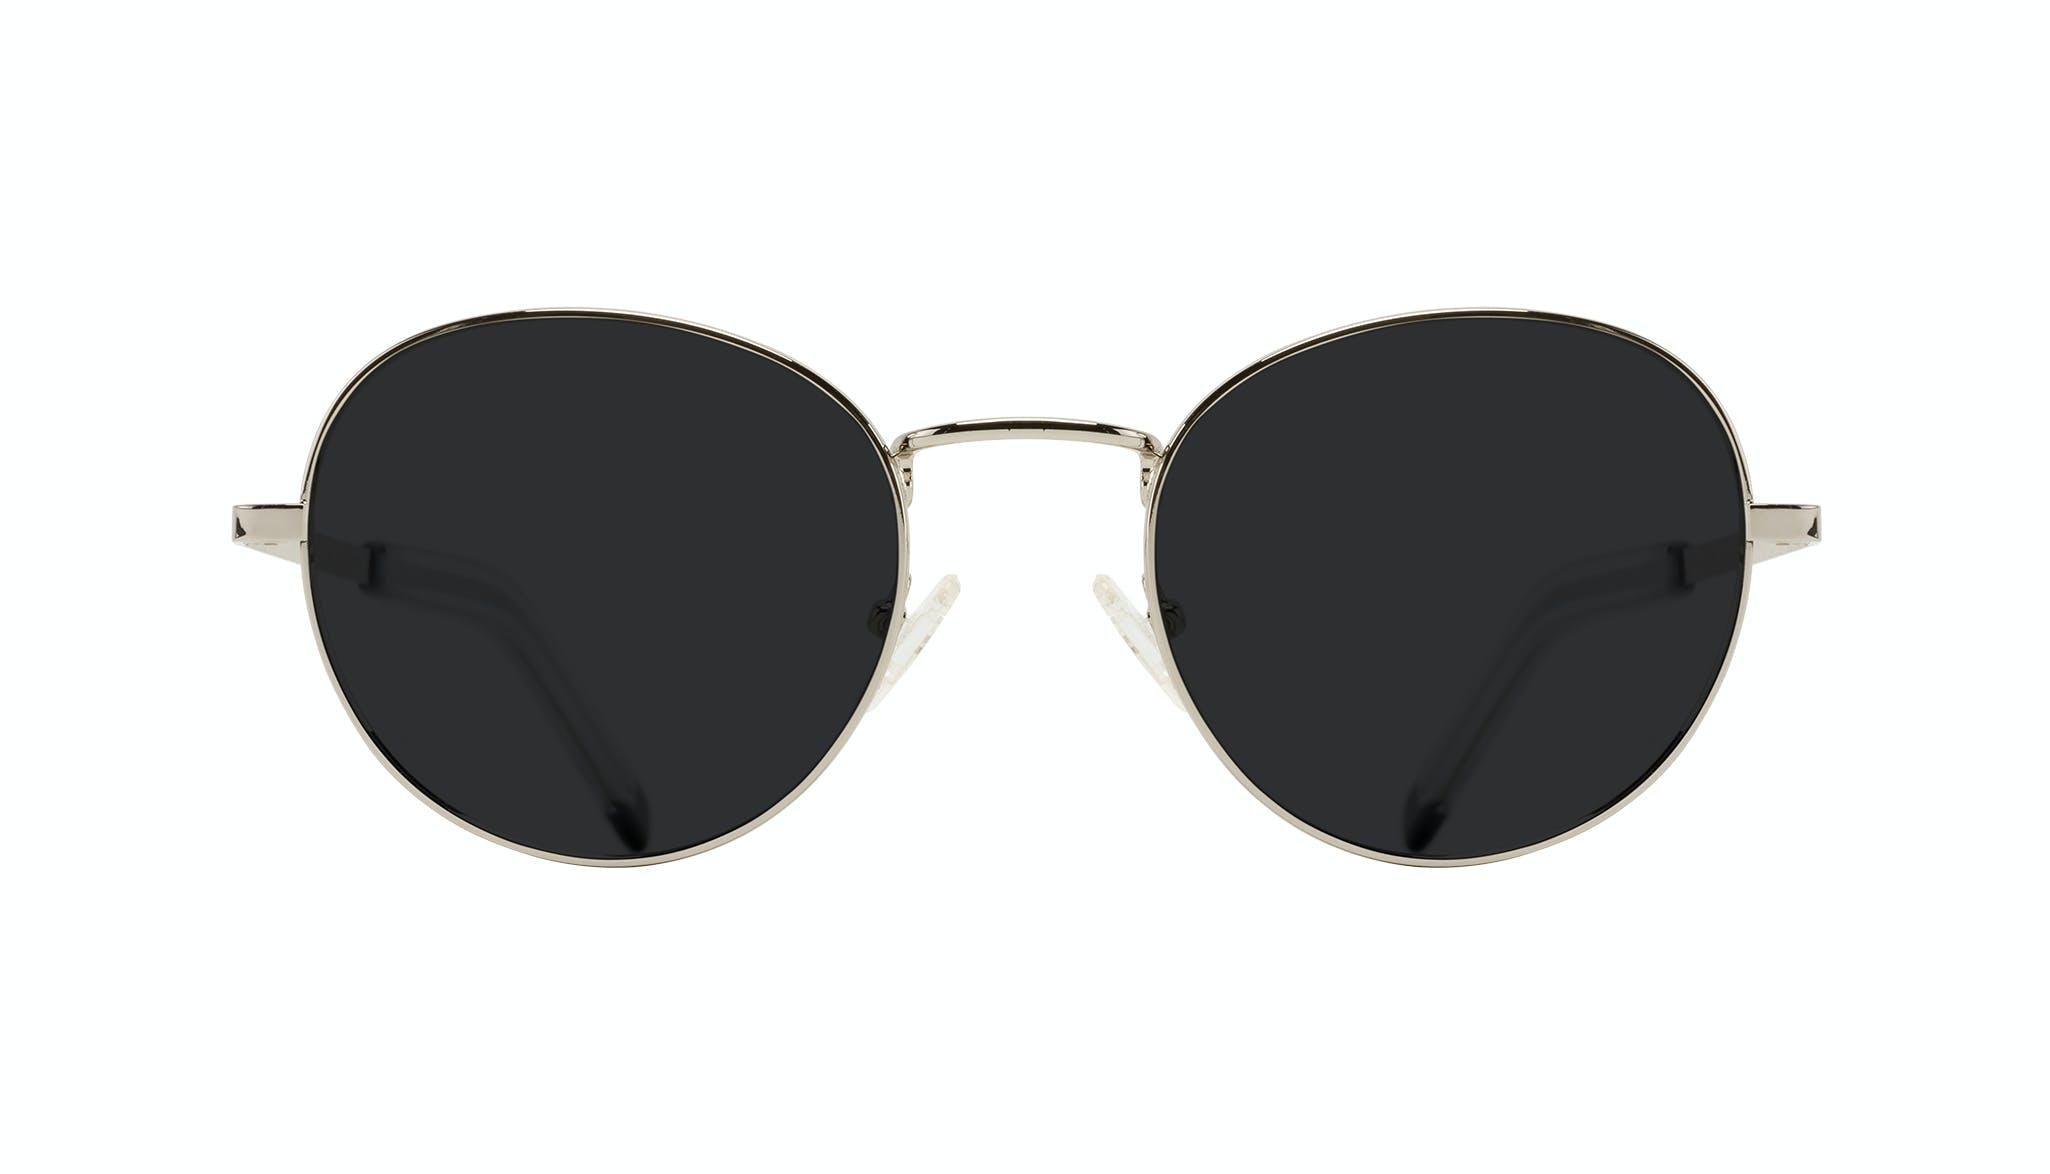 Affordable Fashion Glasses Round Sunglasses Men Lean XL Silver